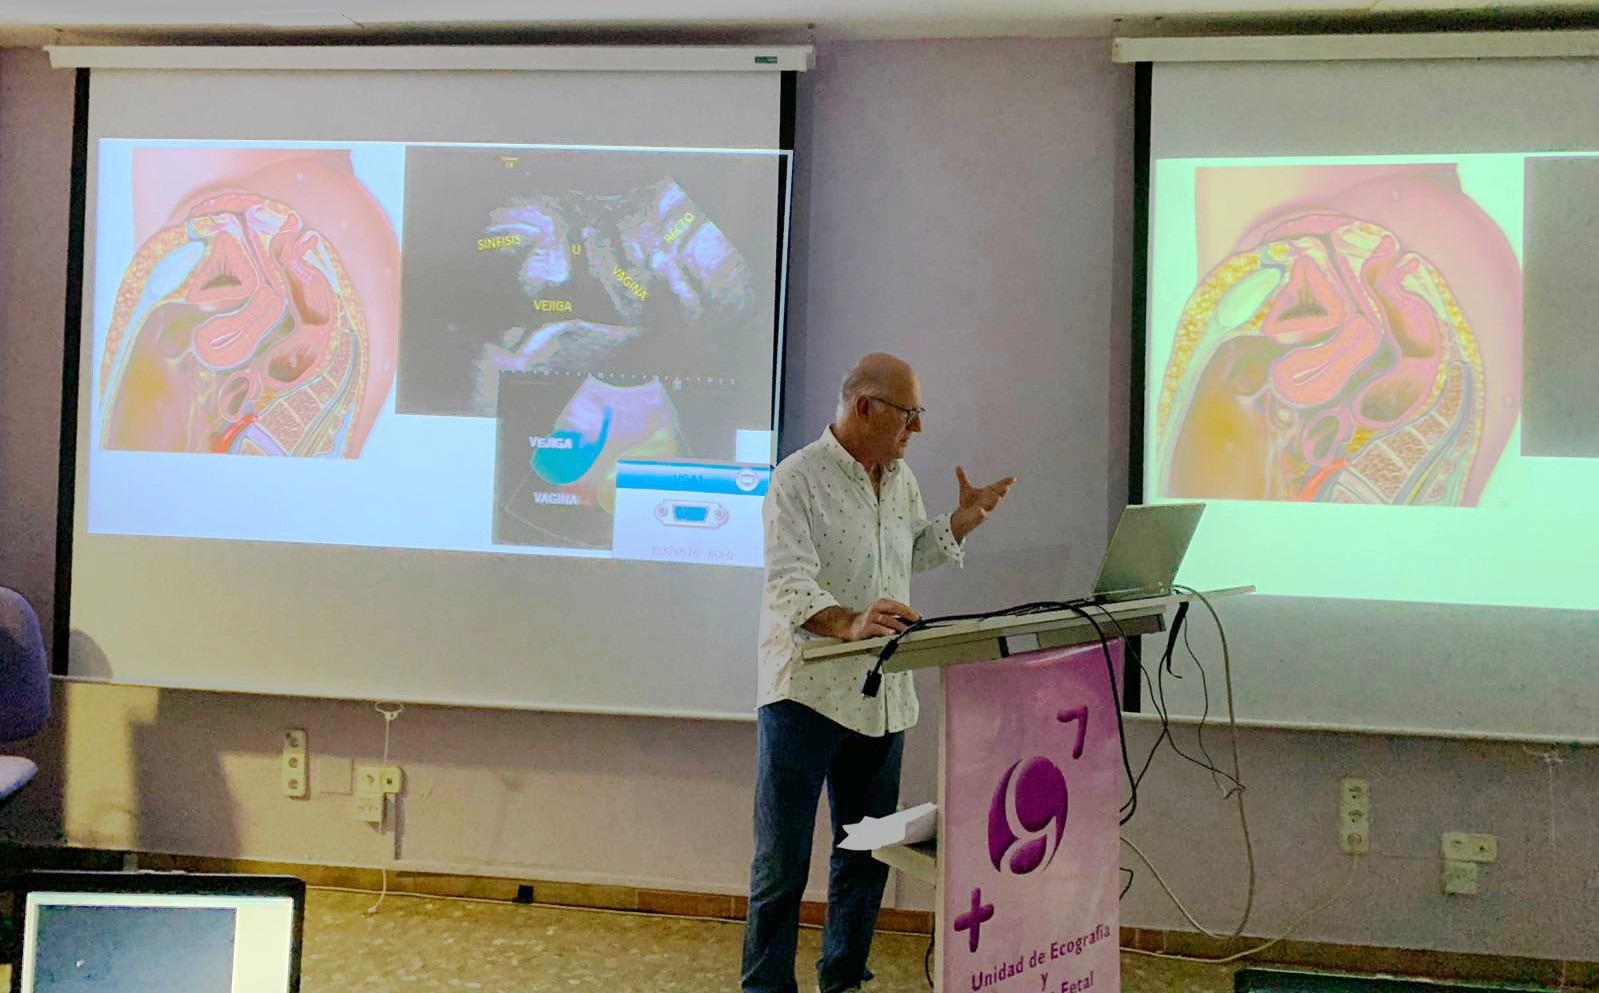 curso ecografia 4d y 5d en Málaga